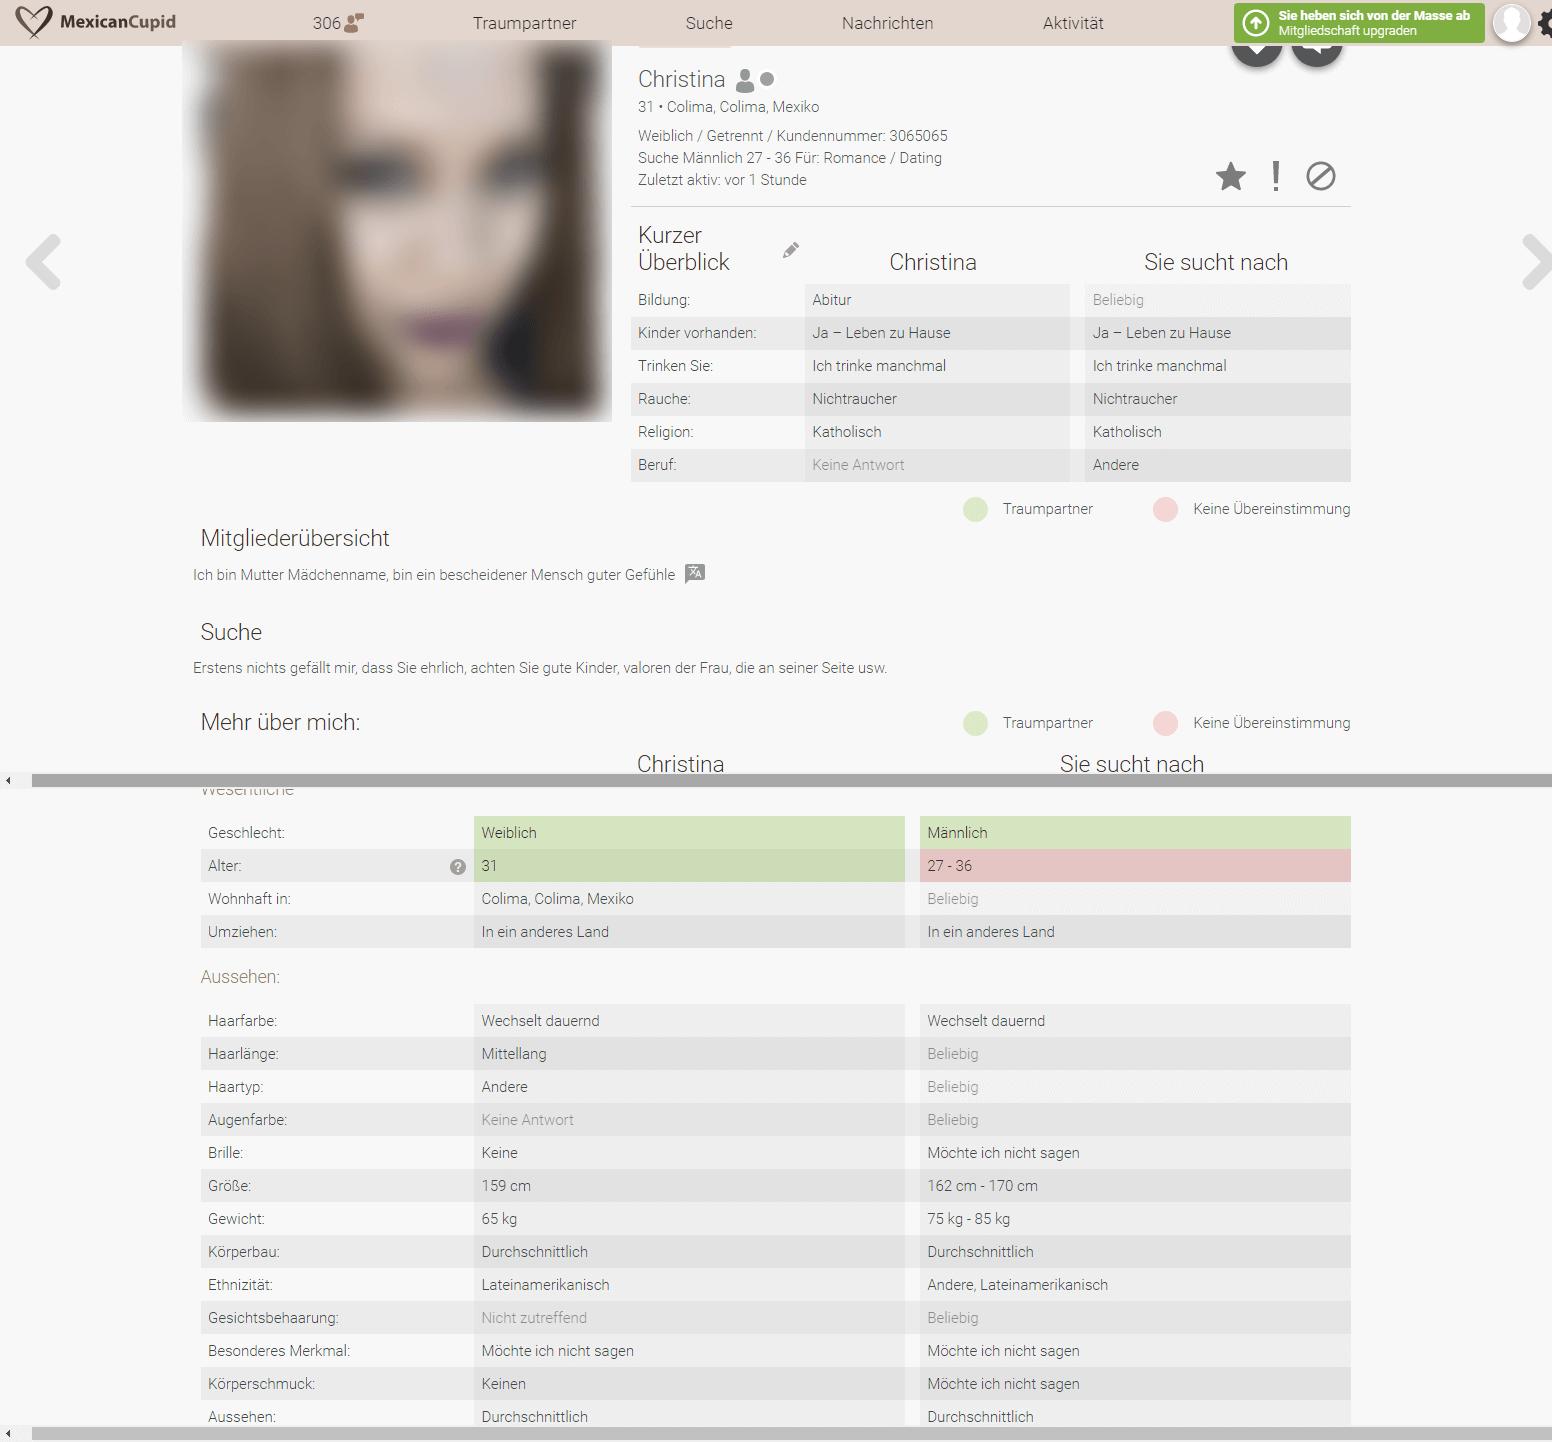 MexicanCupid Profil